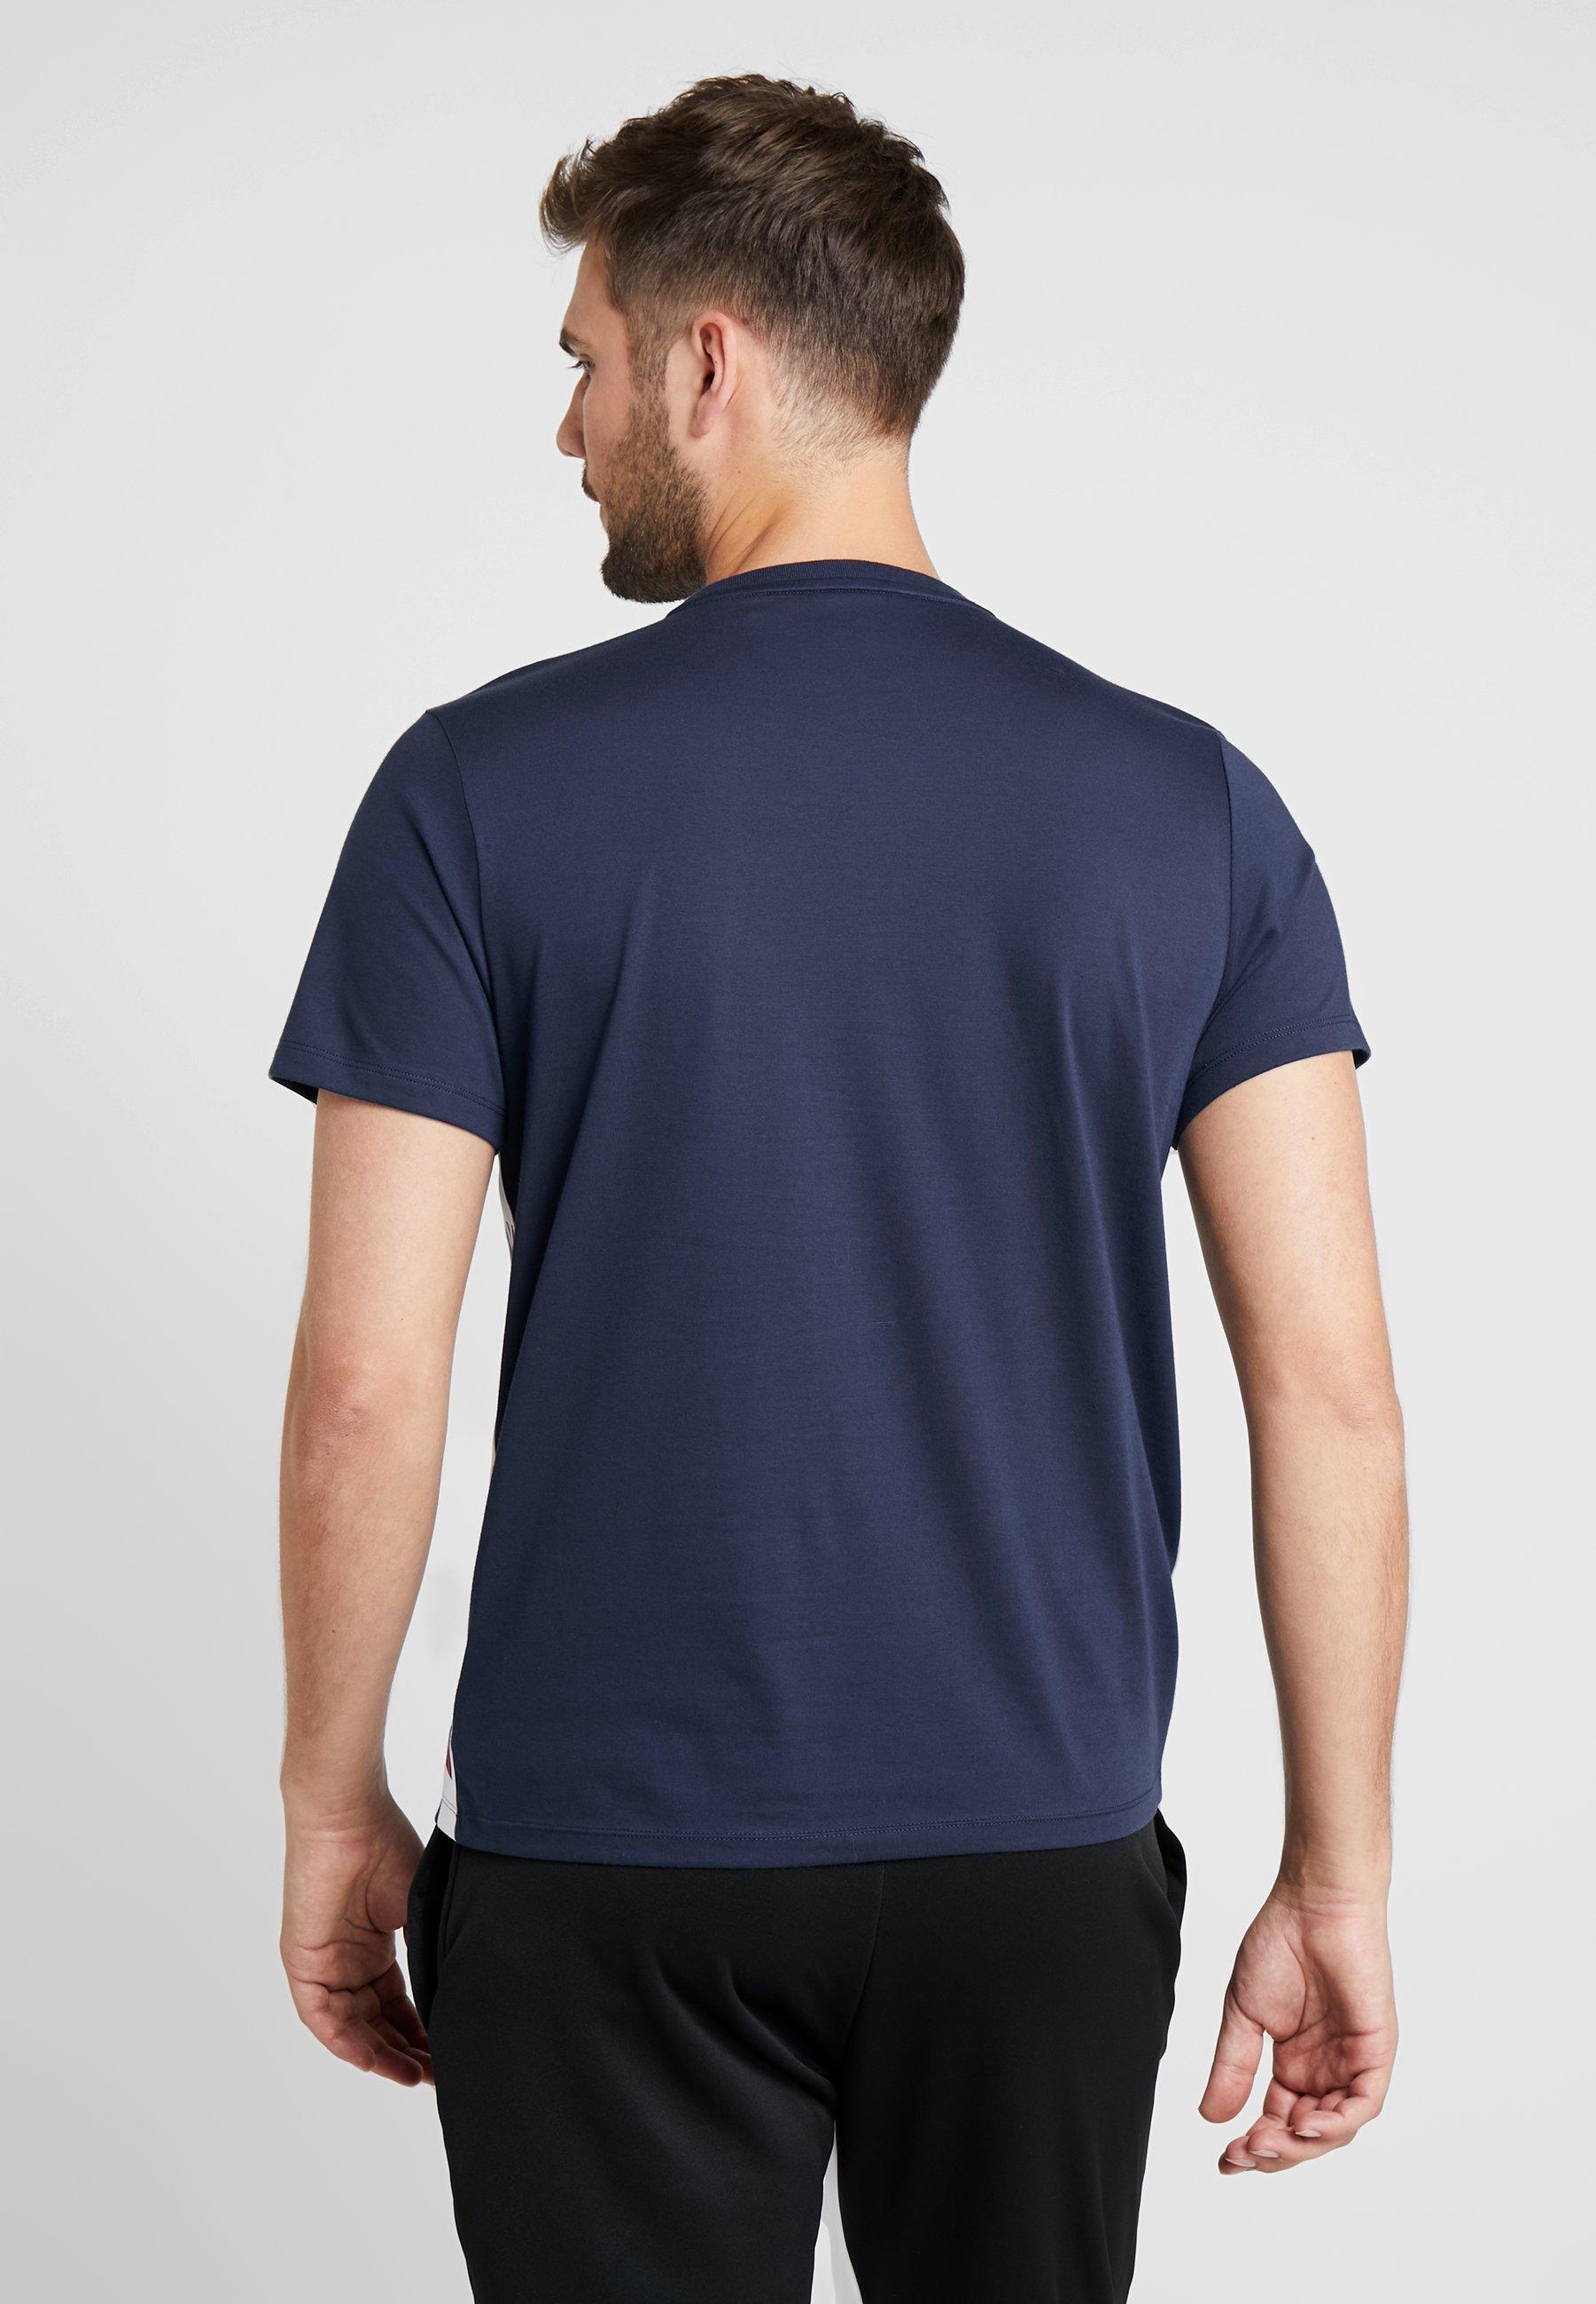 Navy shirt Imprimé Sport TeeT Tommy Tape 6yfbmY7gvI